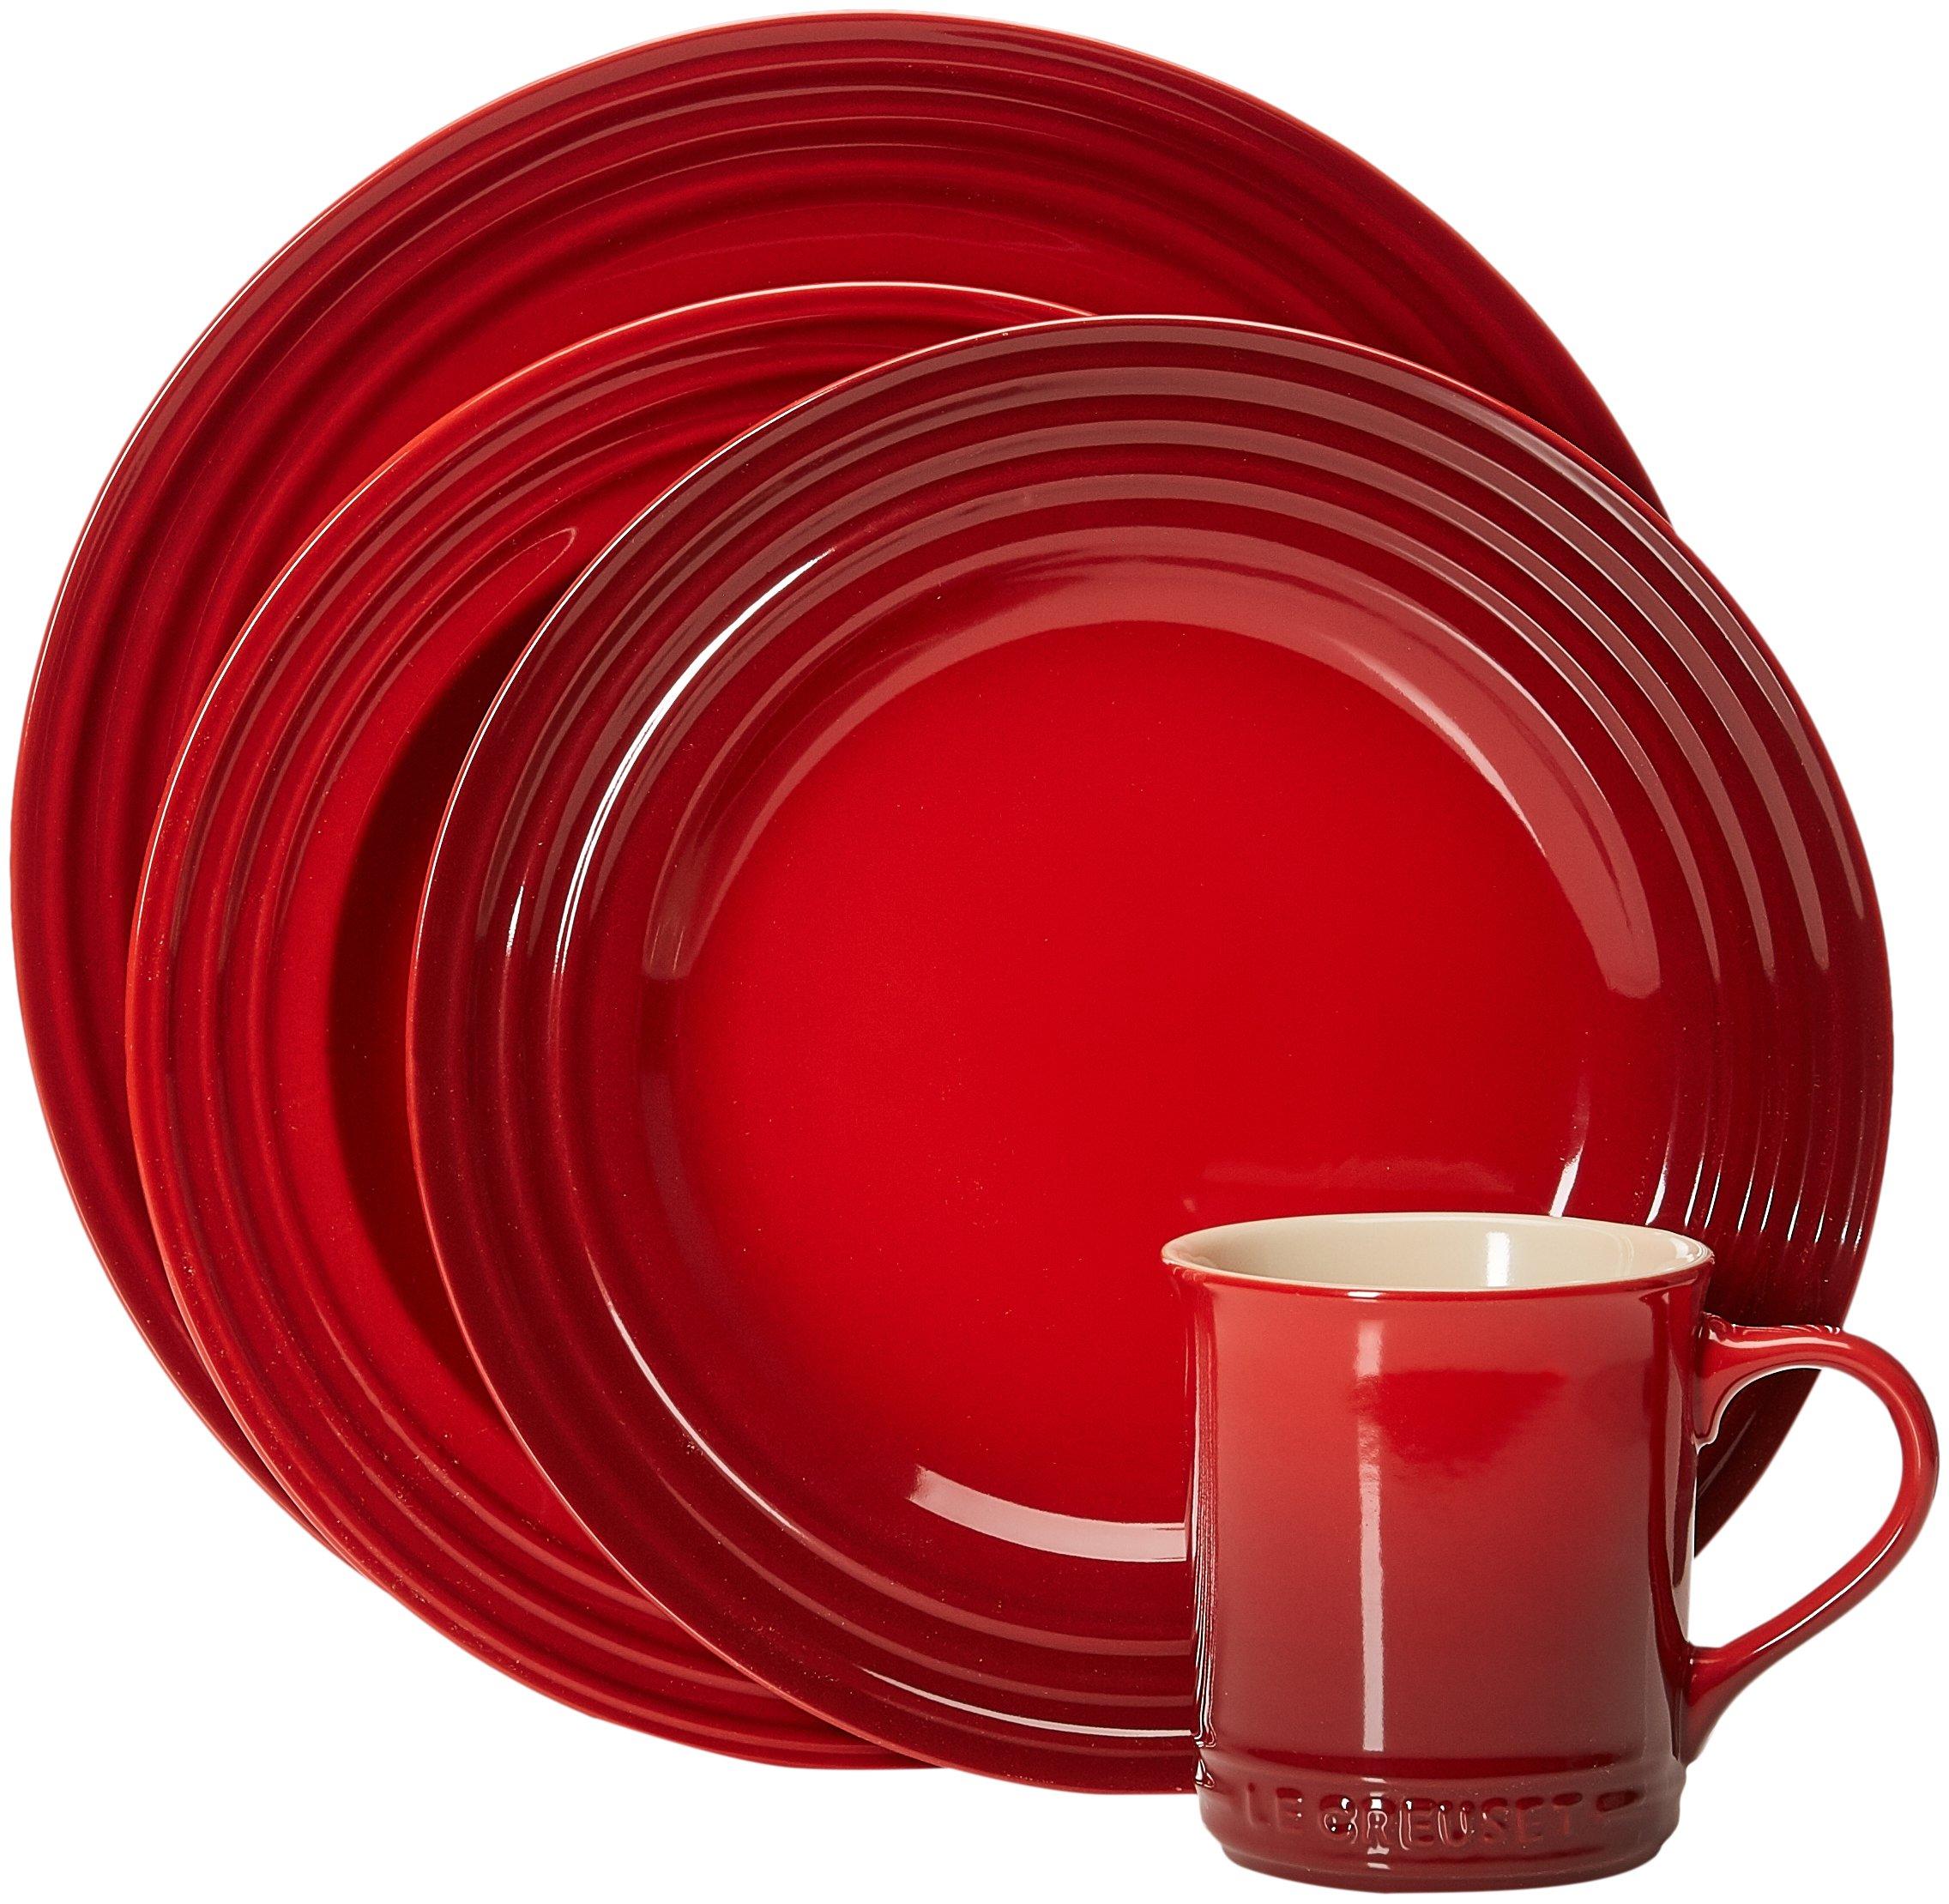 Le Creuset Stoneware 16-Piece Dinnerware Set, Cerise (Cherry Red) by Le Creuset (Image #1)